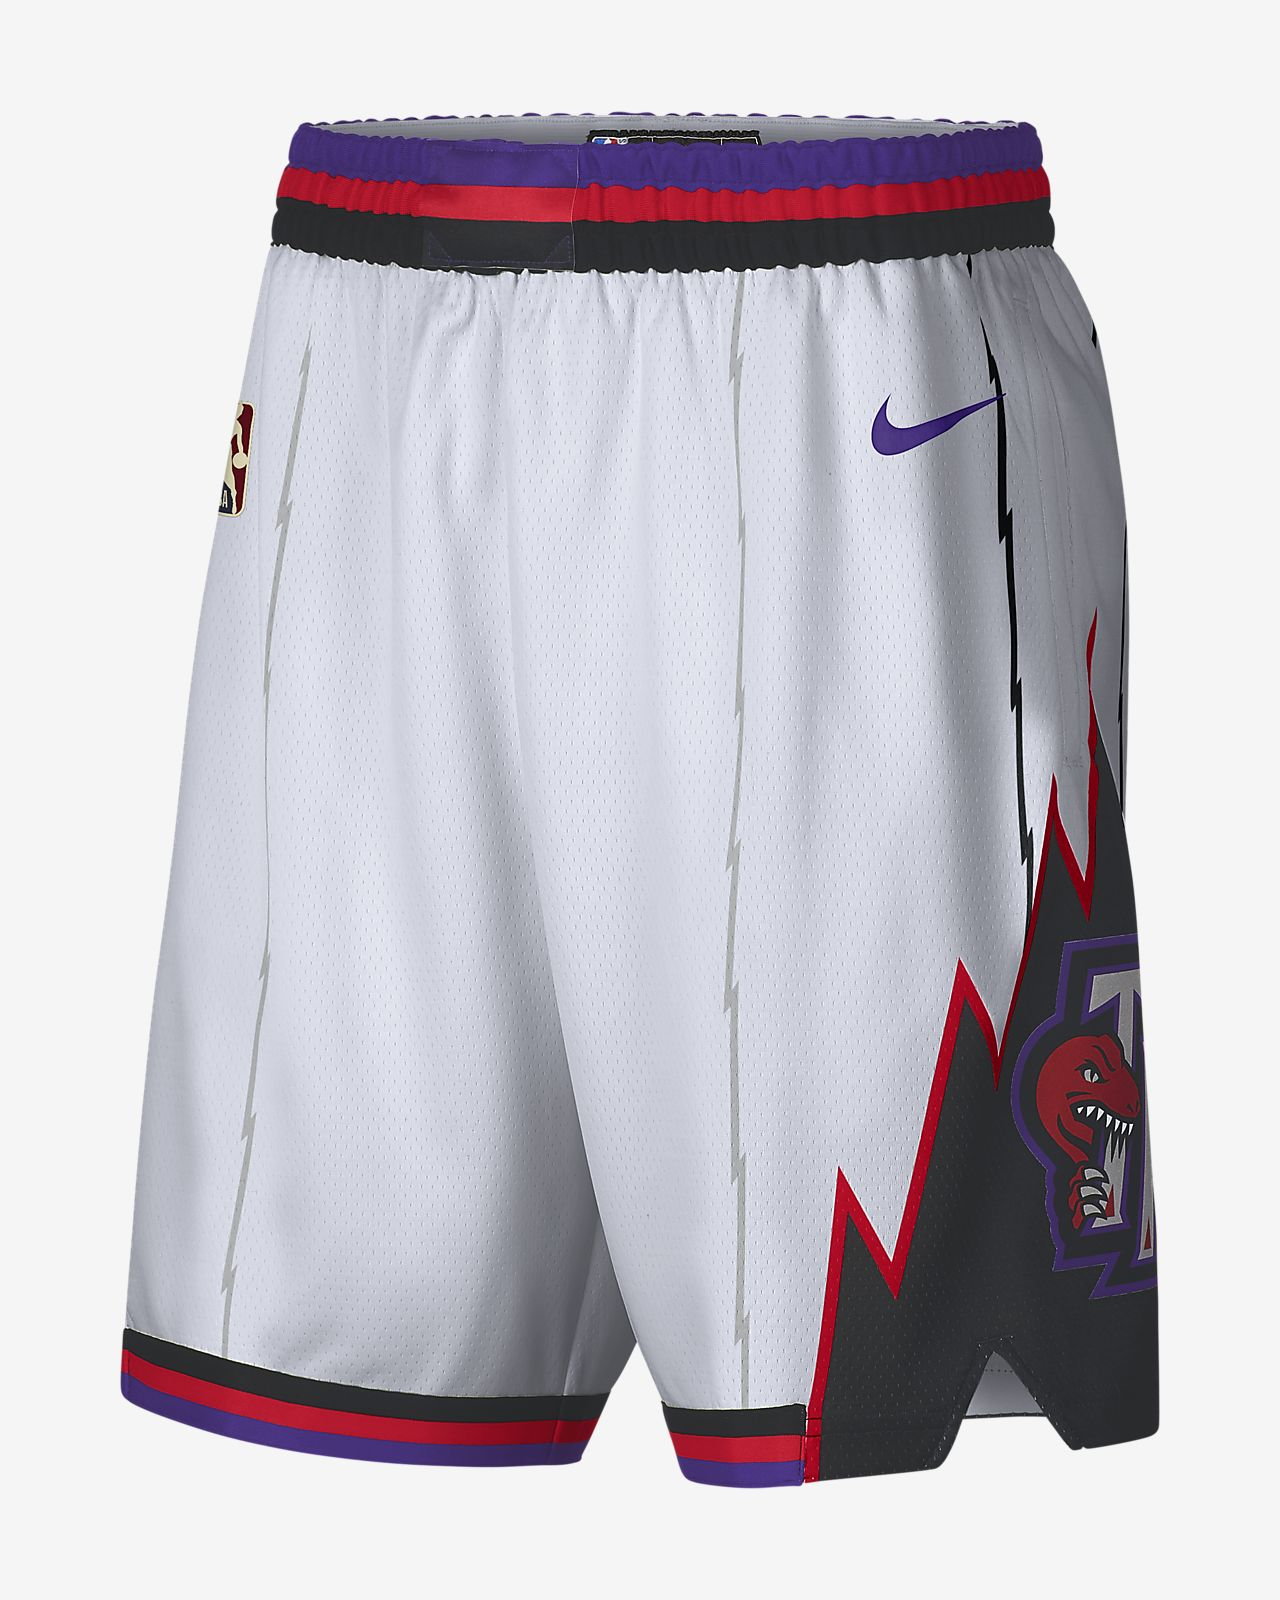 多伦多猛龙队 Classic Edition Swingman Nike NBA 男子短裤